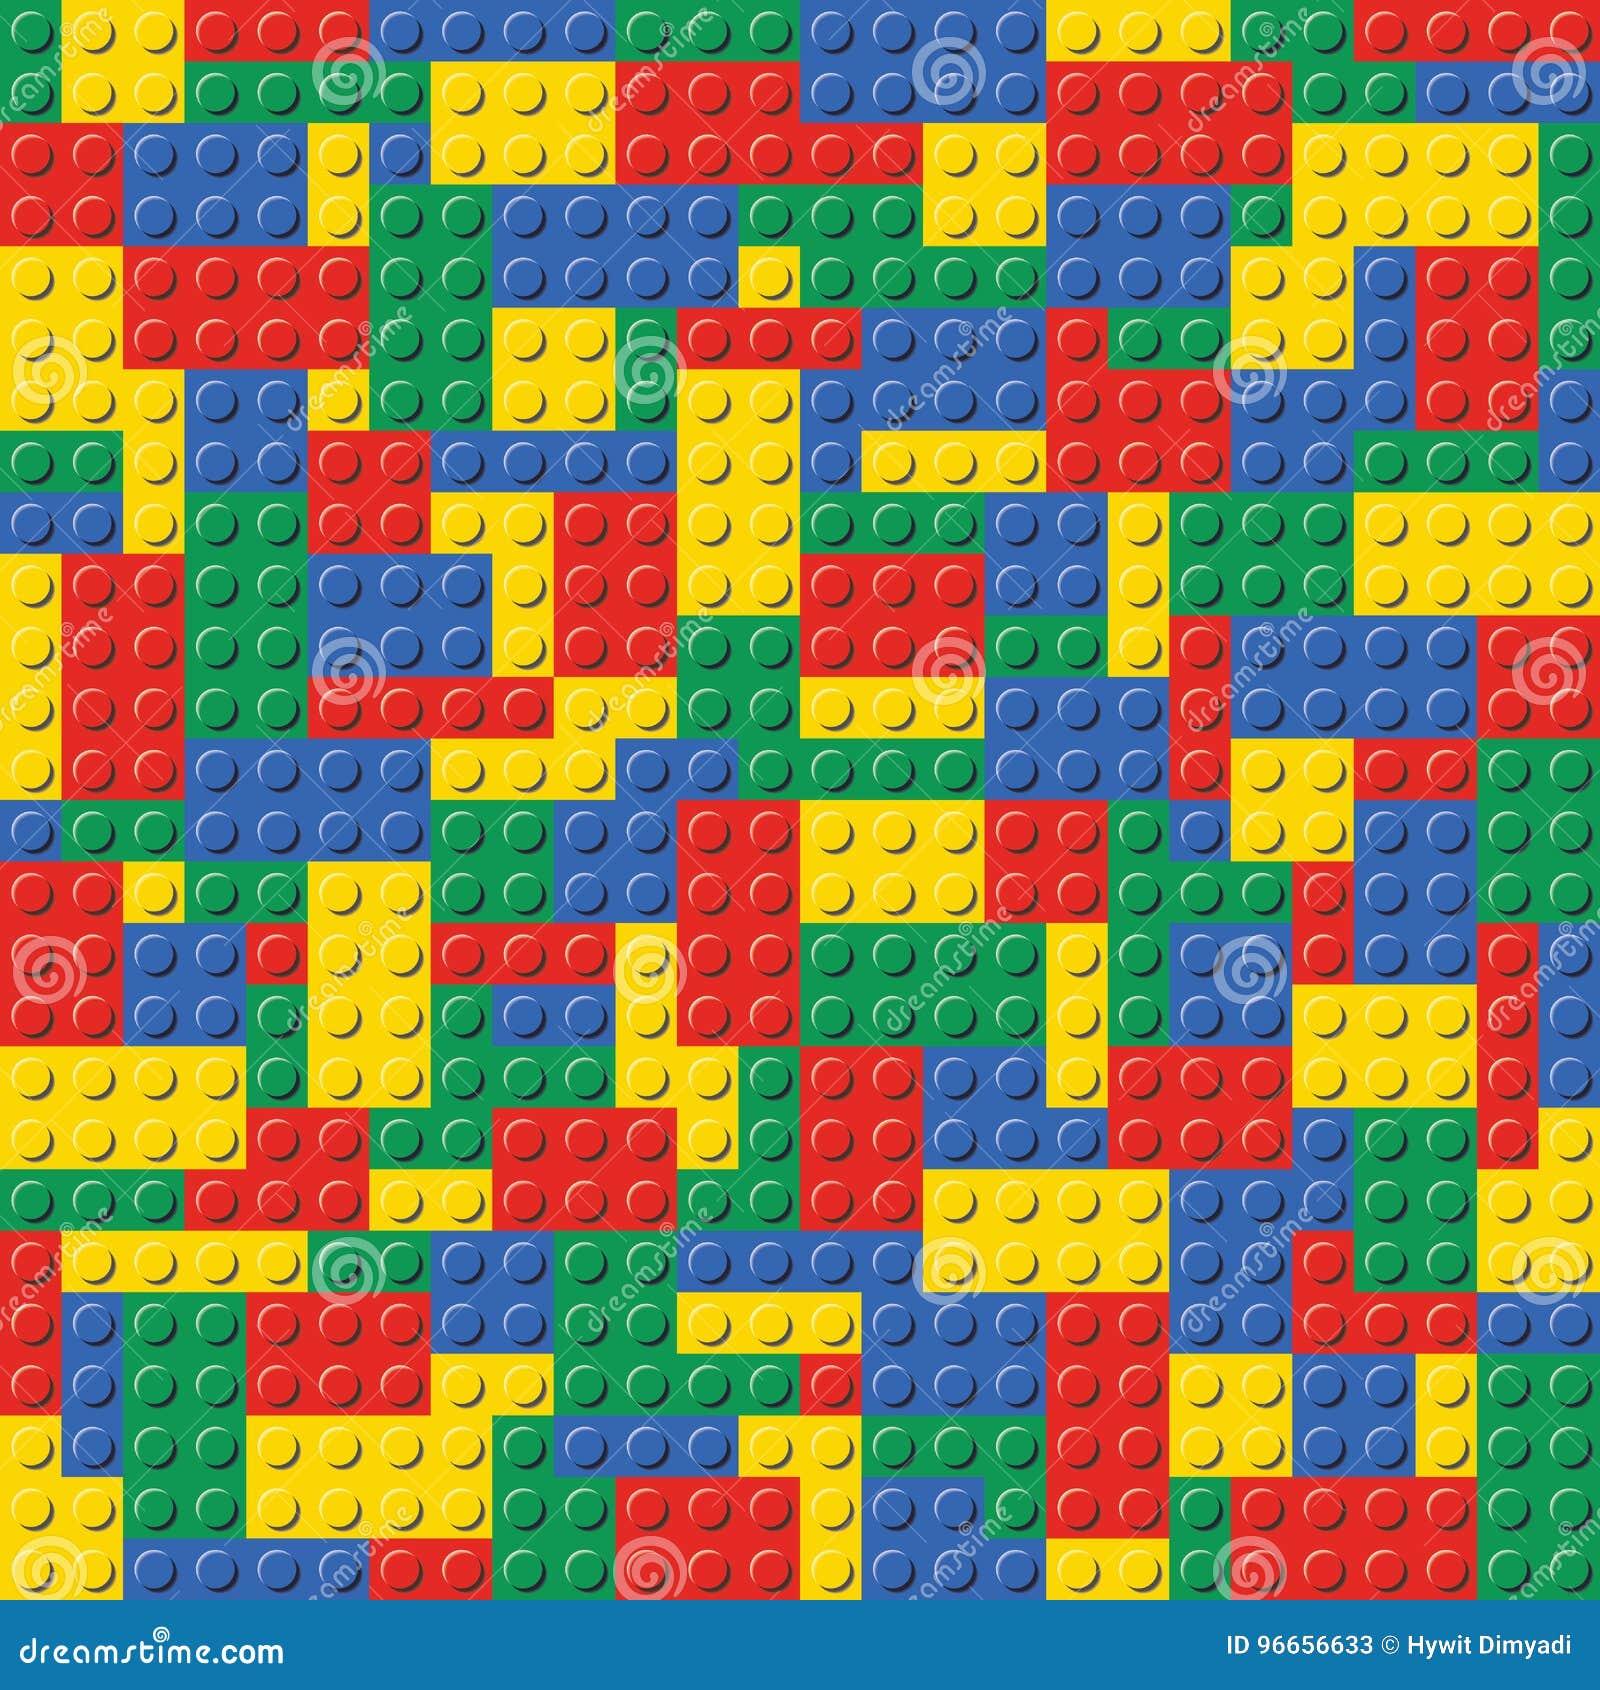 Lego Brick Seamless Background Pattern